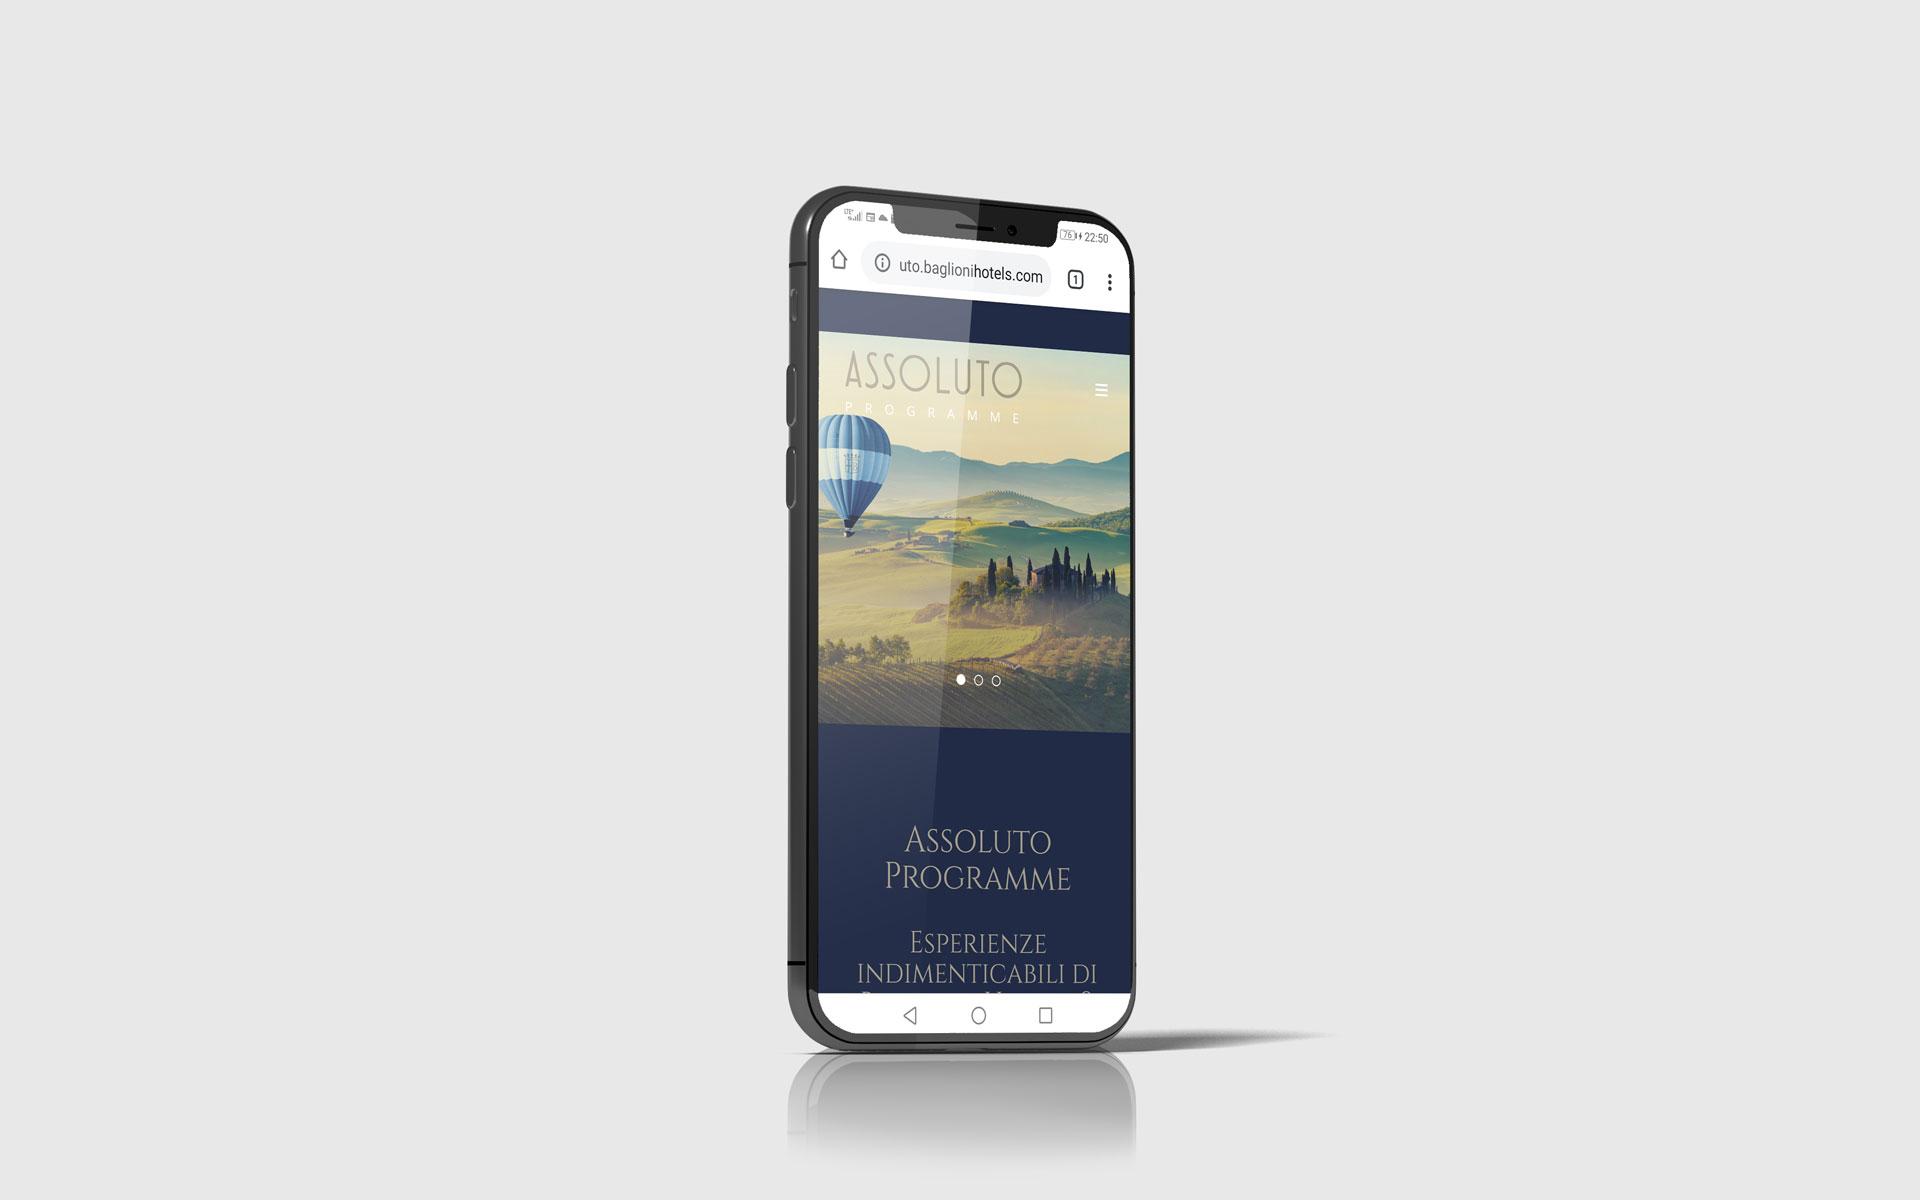 Assoluto Baglioni Hotels mobile